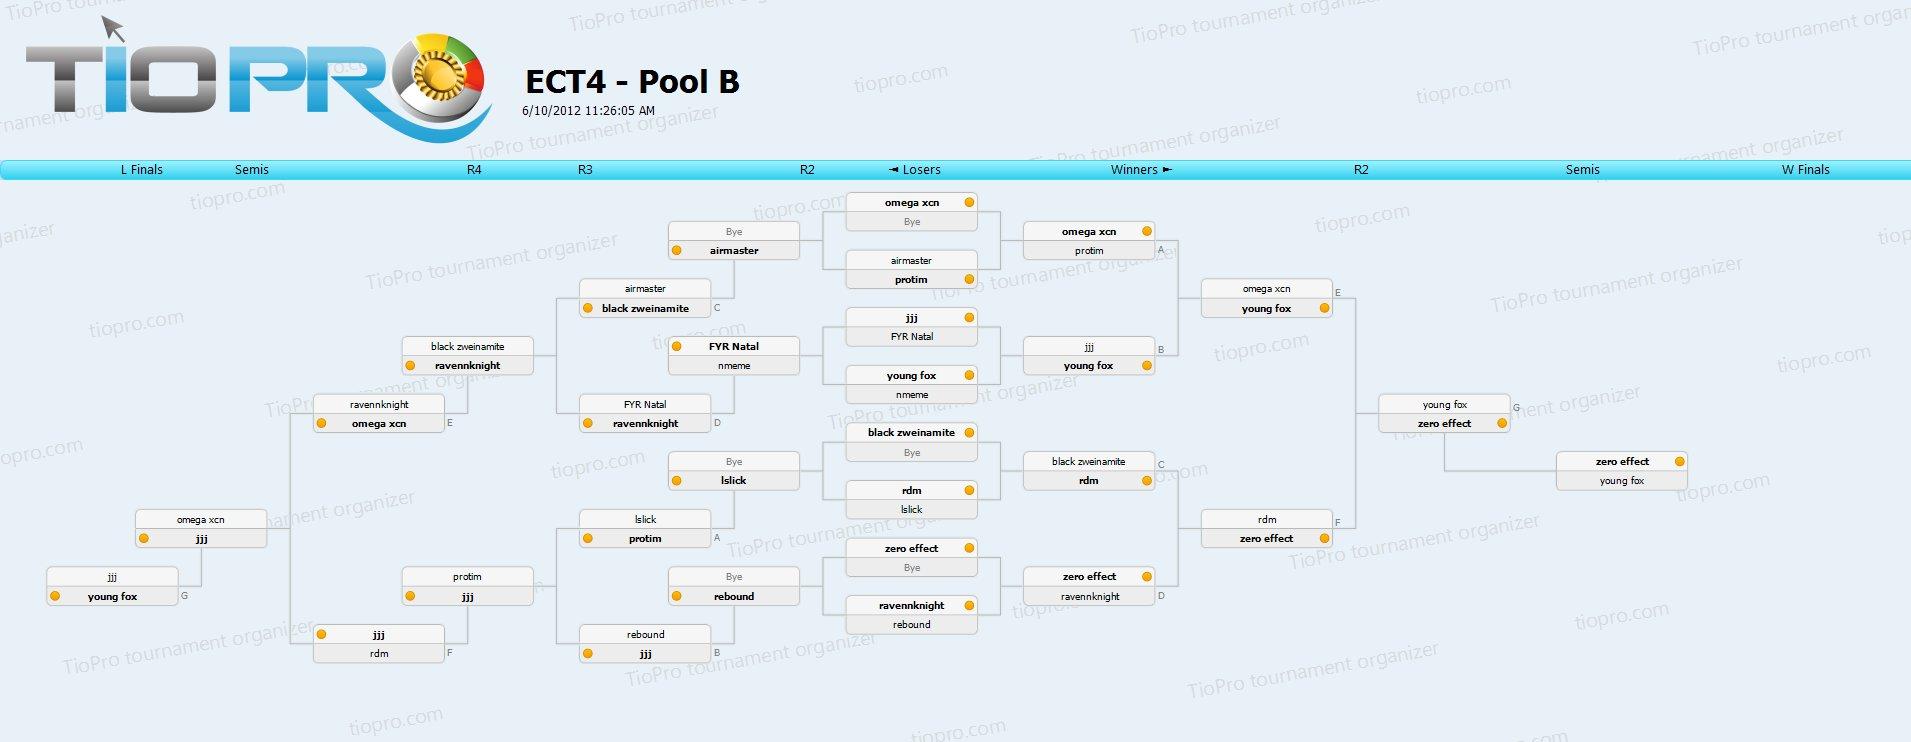 East Coast Throwdown 4 - Pool B